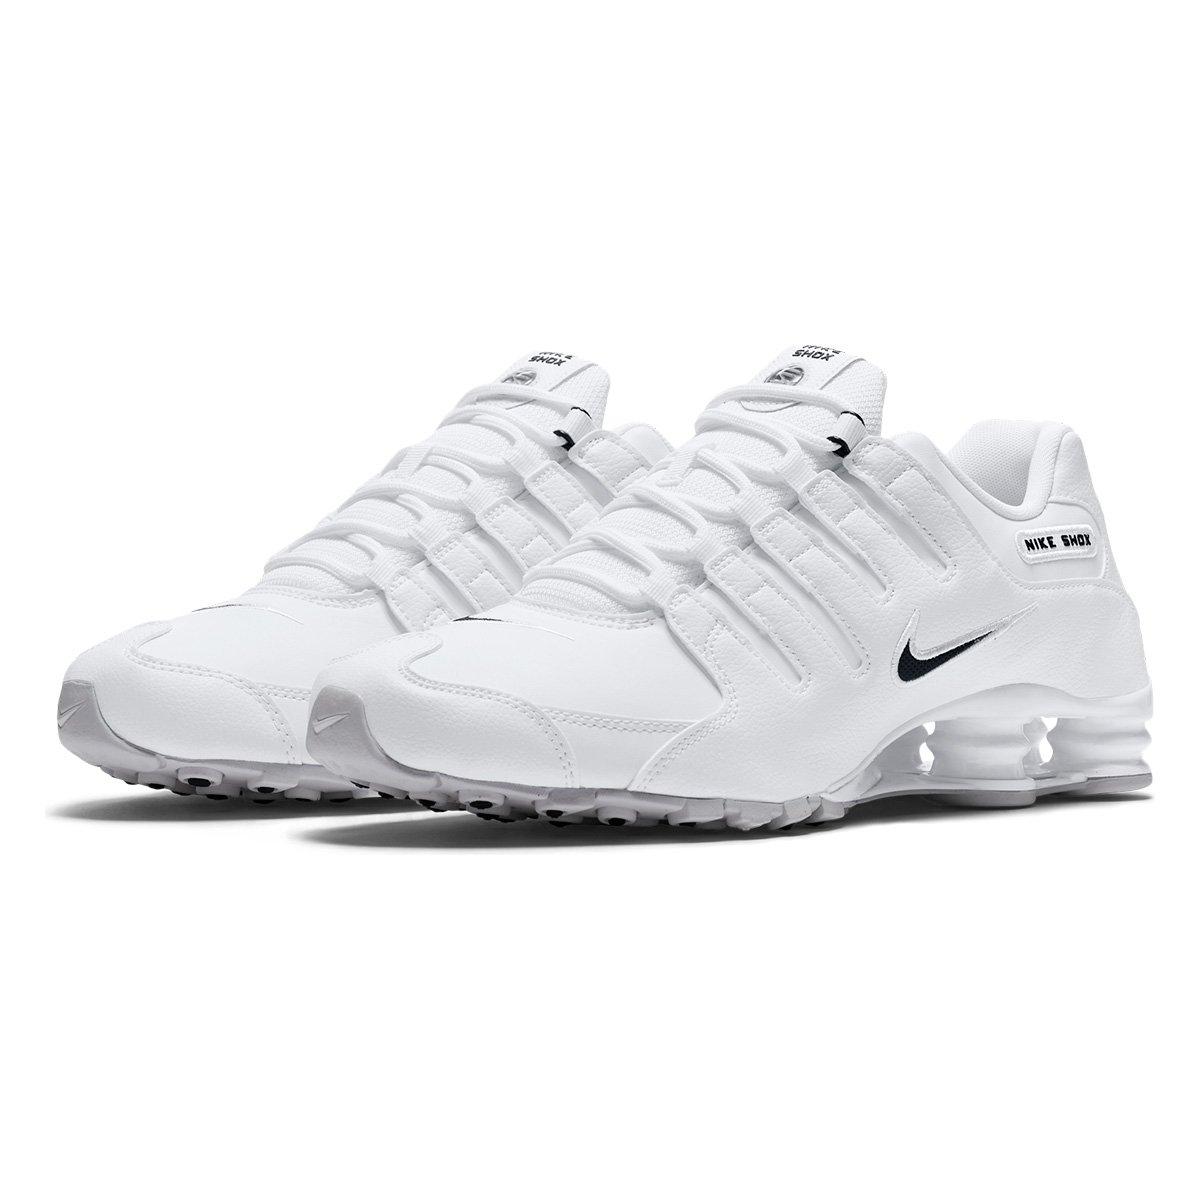 3ec9ddf718 Tênis Nike Shox Nz Eu Masculino - Branco - Compre Agora